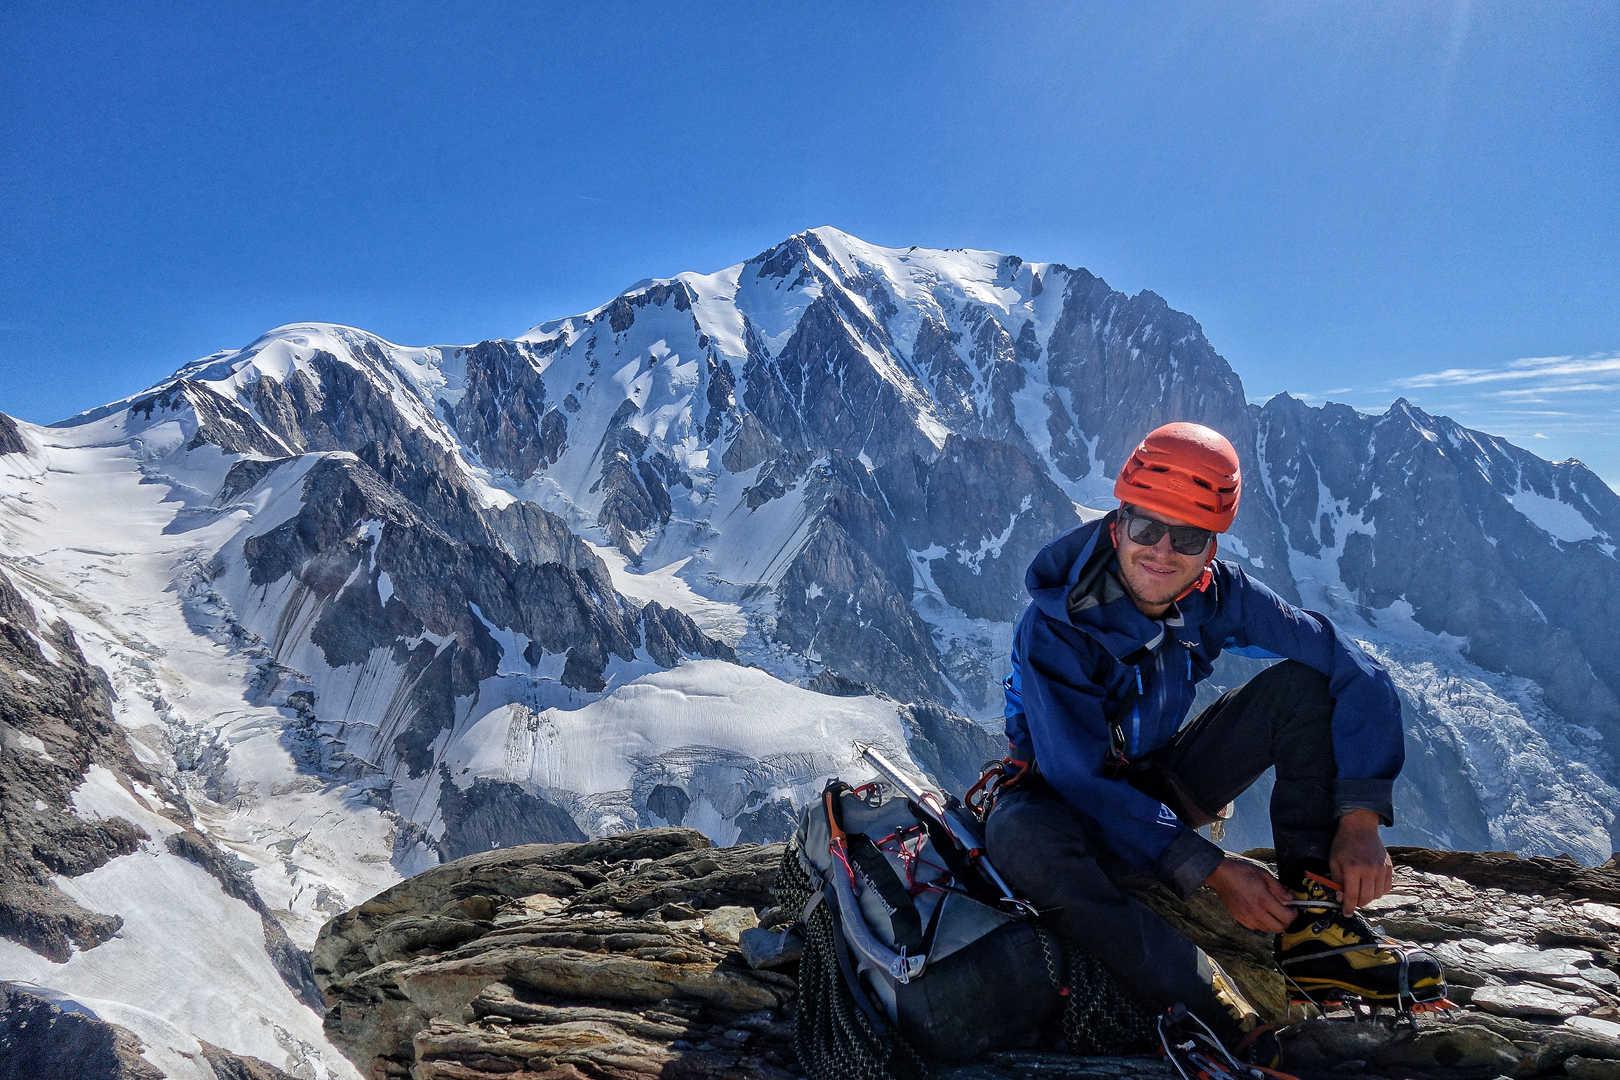 Gipfelrast mit Panorama - Der Mont Blanc